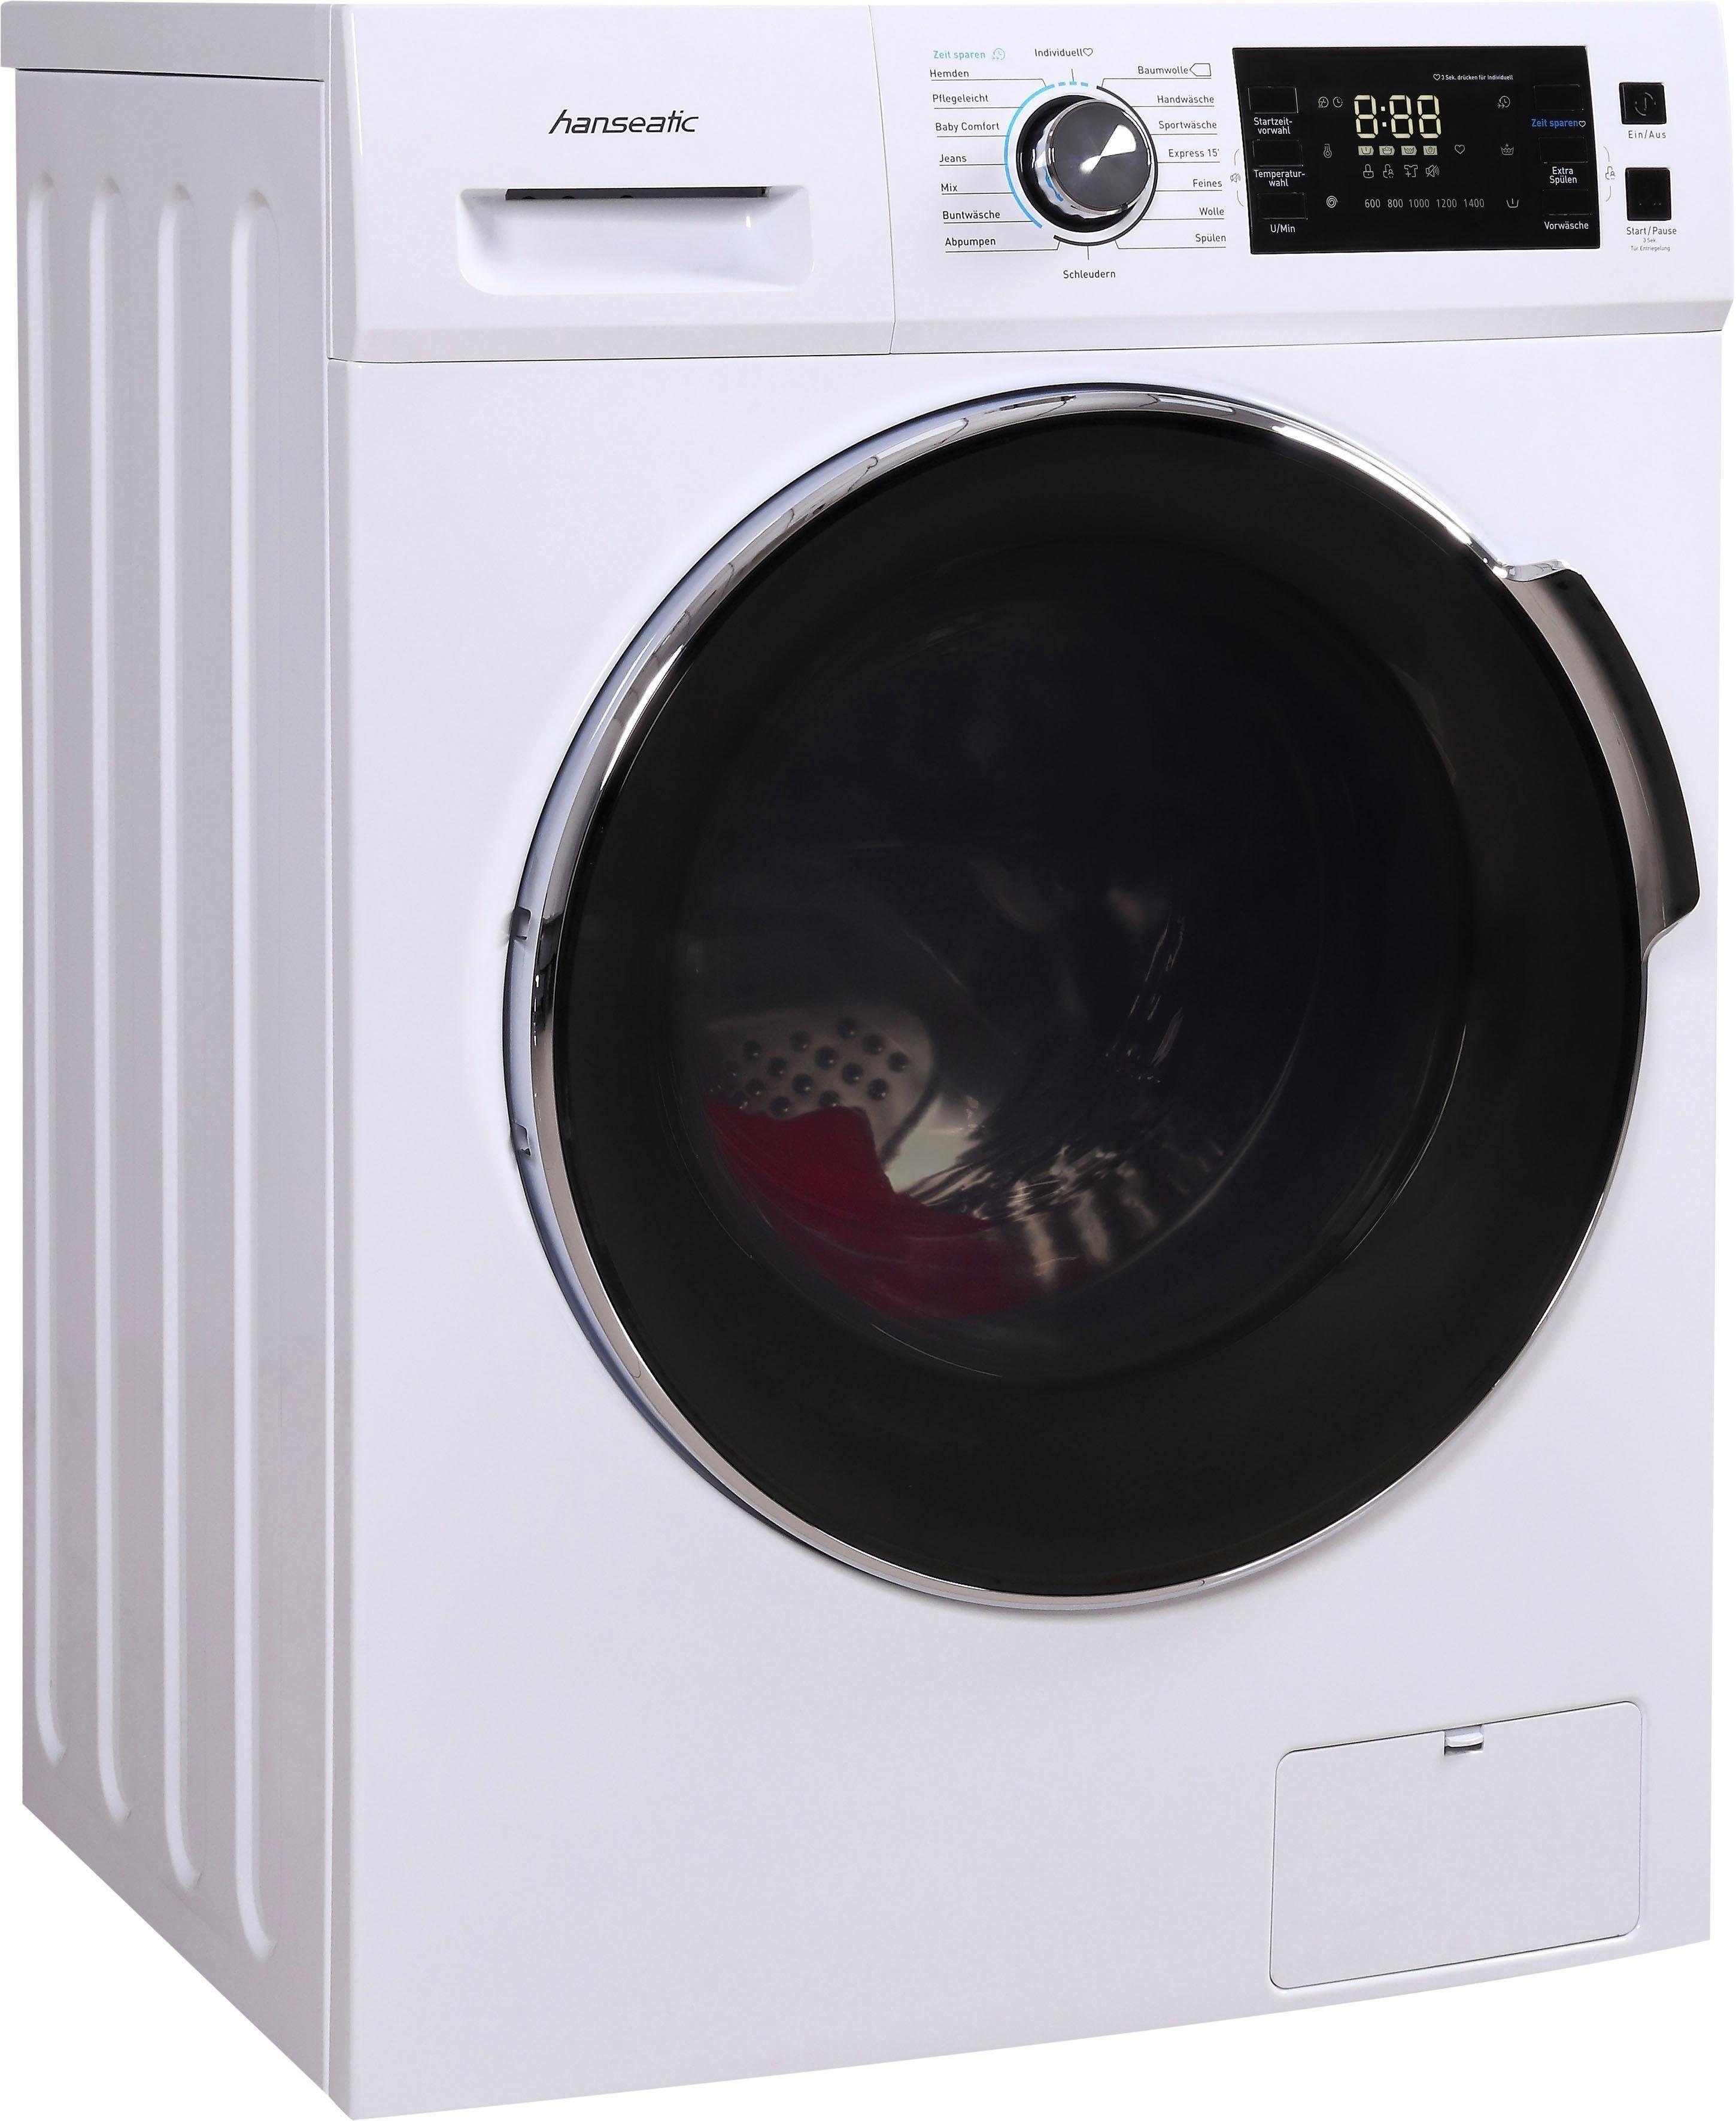 Hanseatic Waschmaschine HWMB714A3, 7 kg, 1400 U/Min, Energieeffizienzklasse A+++